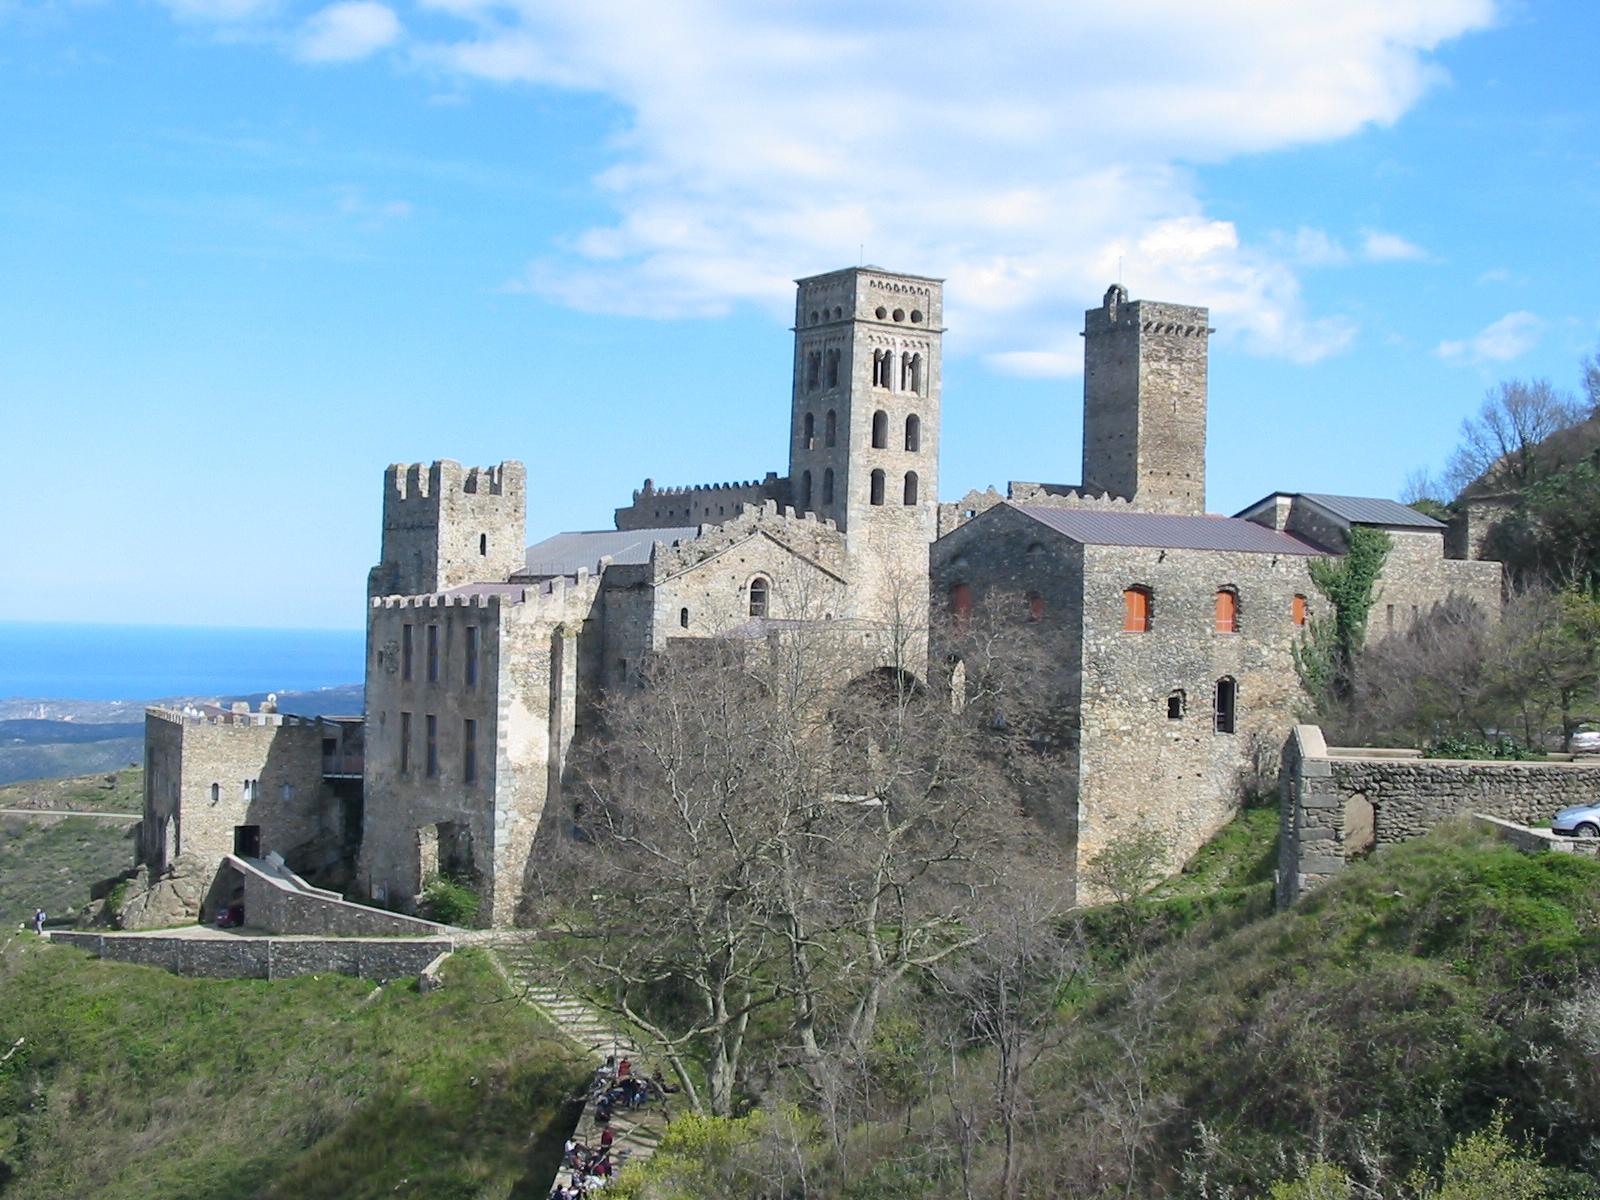 File:Sant Pere de Rodes.JPG - Wikimedia Commons